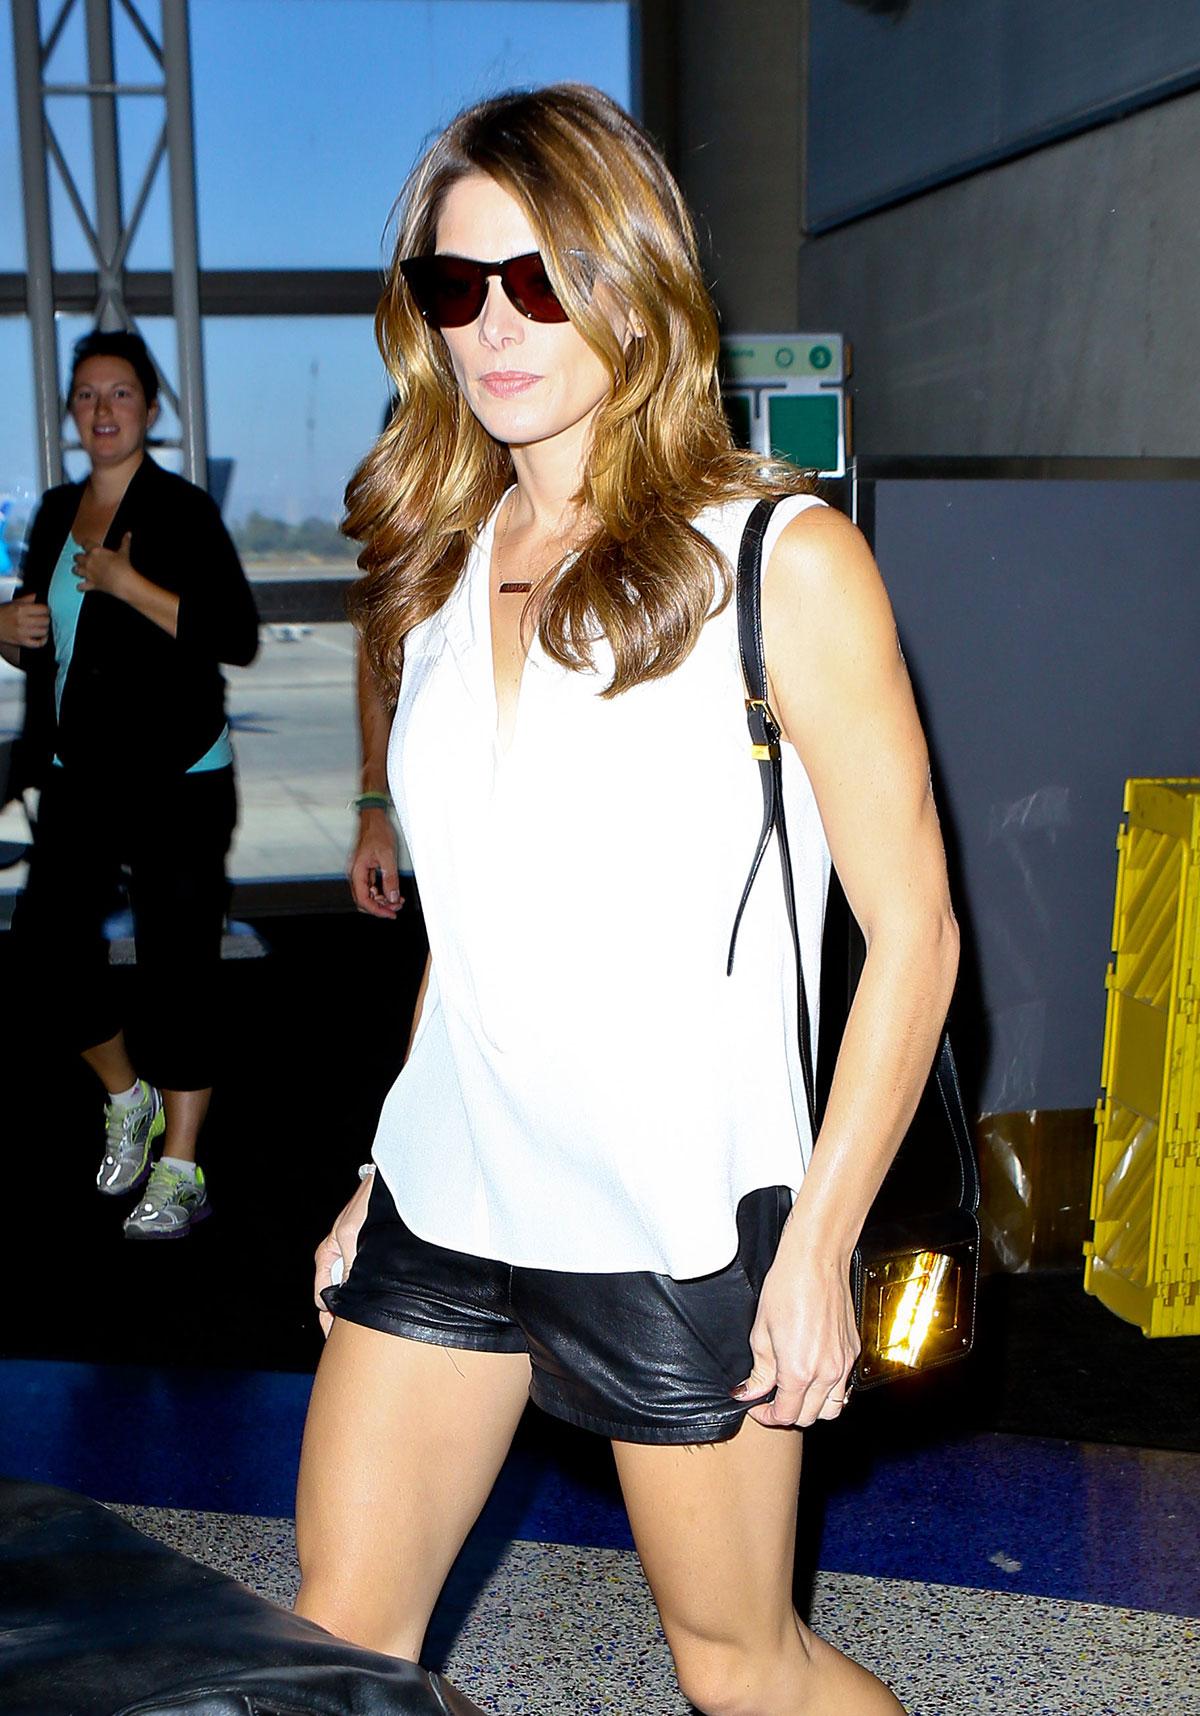 Ashley Greene seen at LAX airport in LA